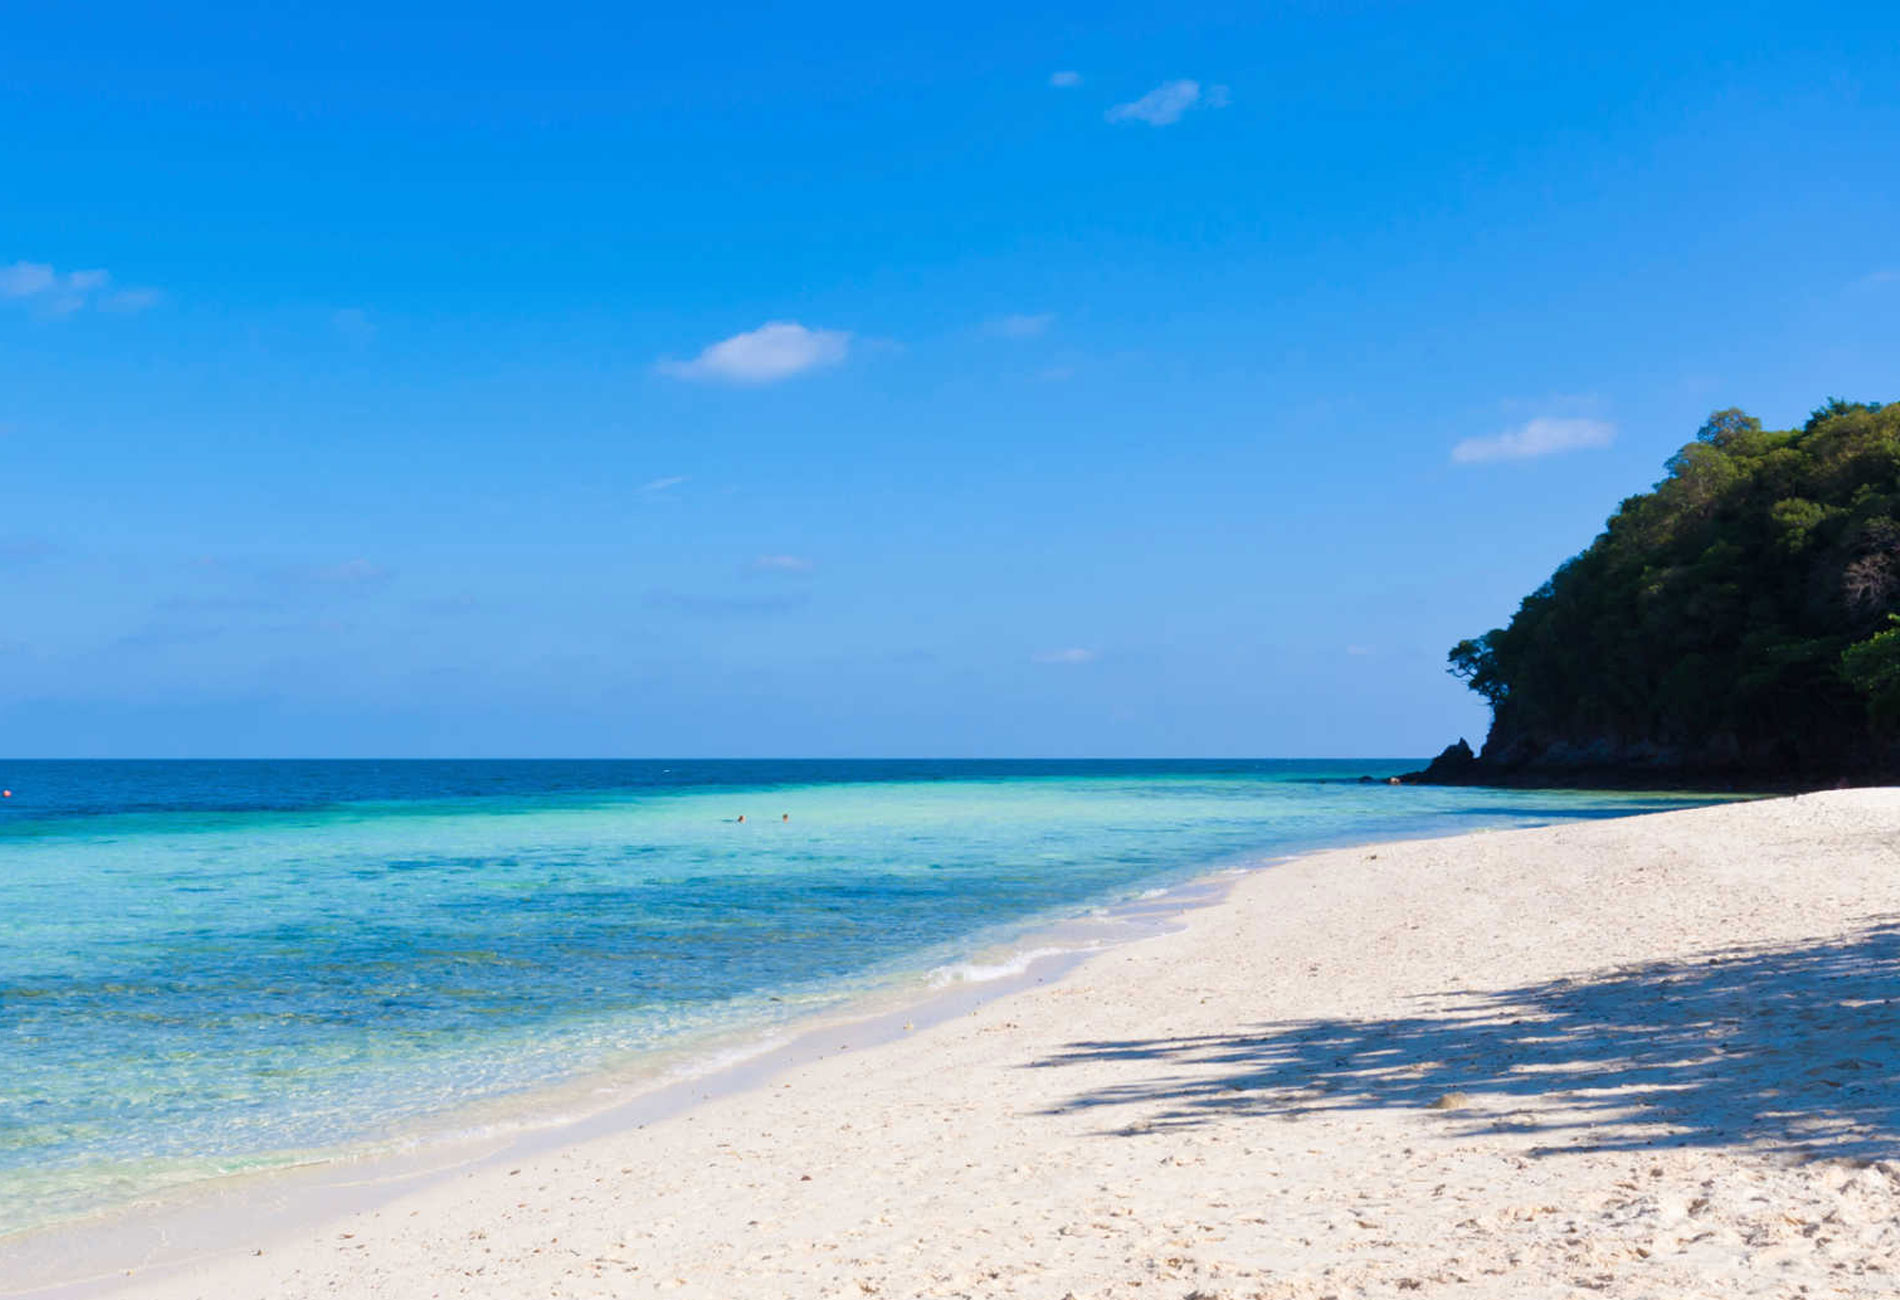 Koh Samet getaway - Go Thai. Be Free - Tourism Authority